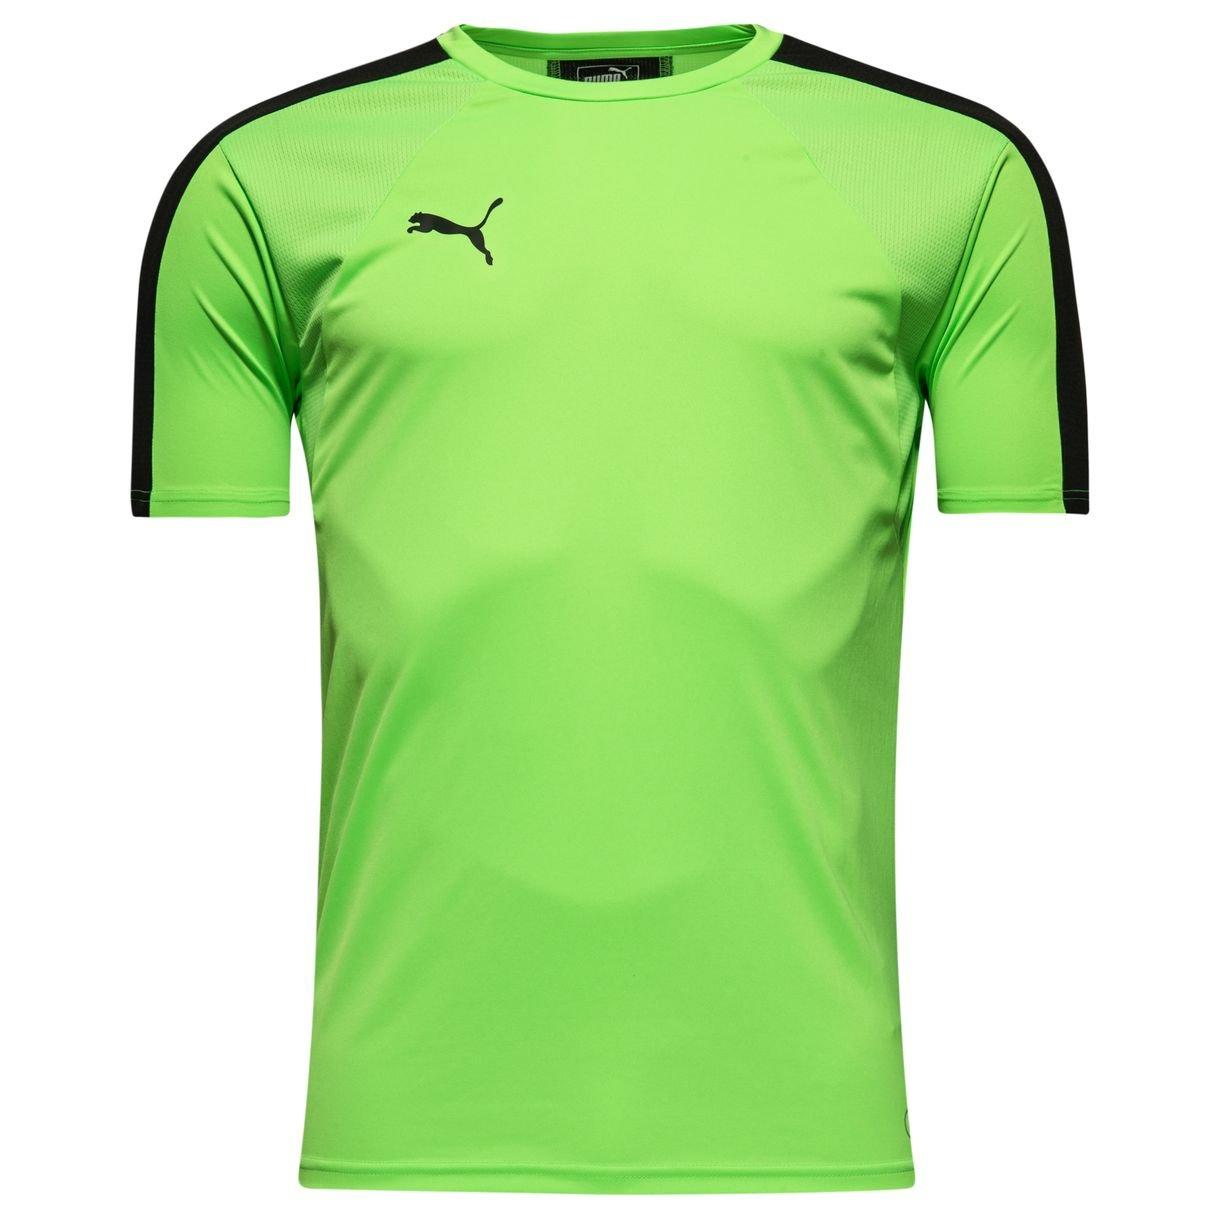 Pánské tréninkové tričko Puma IT evoTRG bdedde89ef